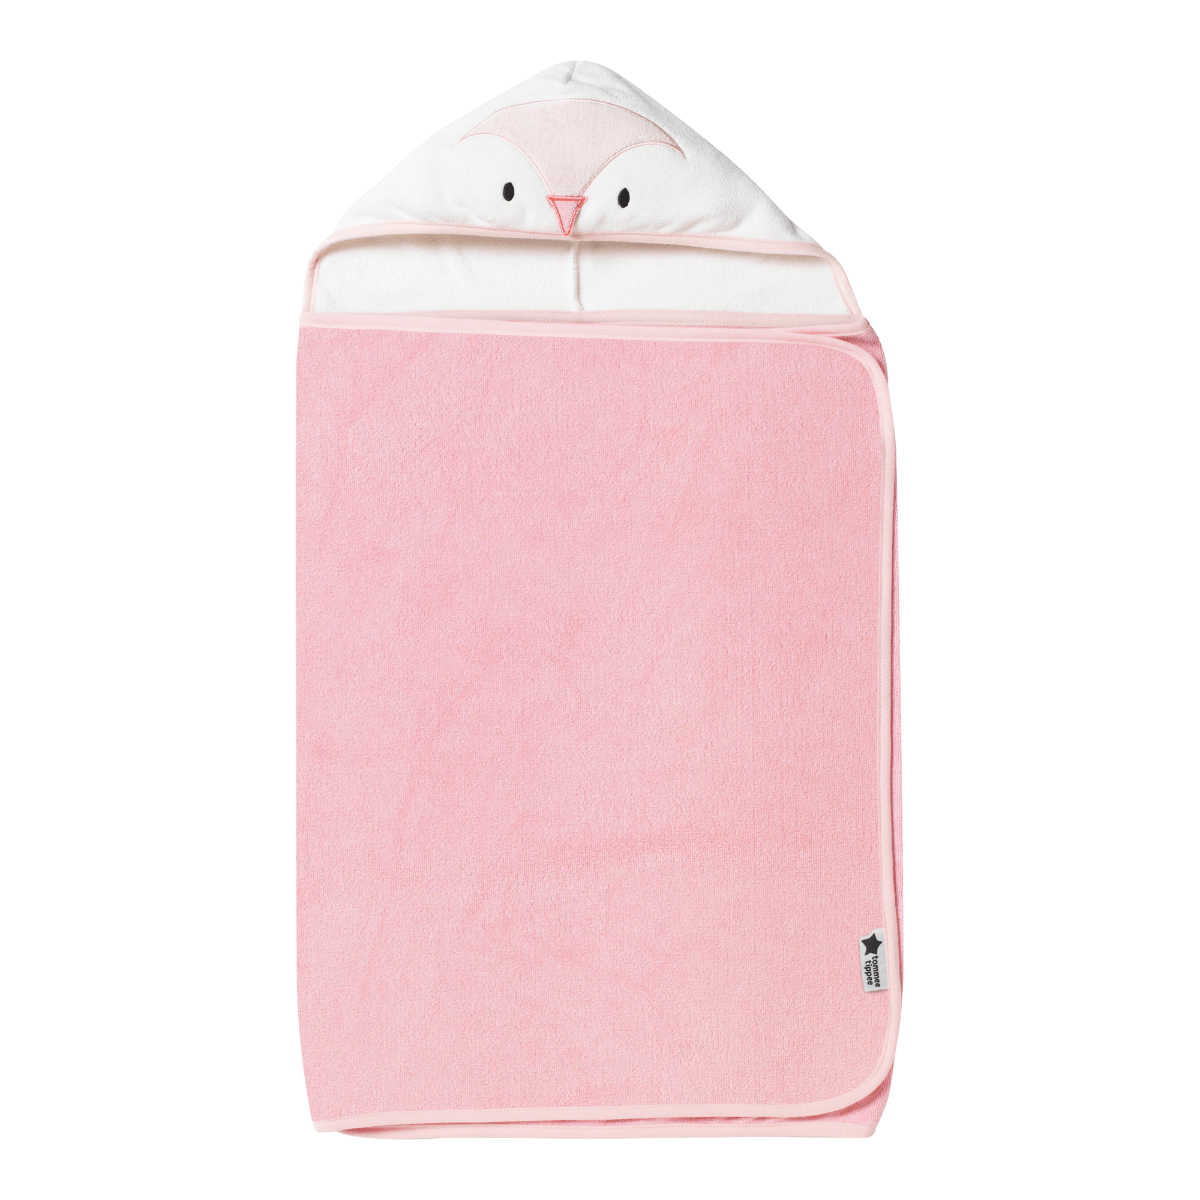 Osuška s kapucí Hug 'n' Dry 6-48m Penny Pink